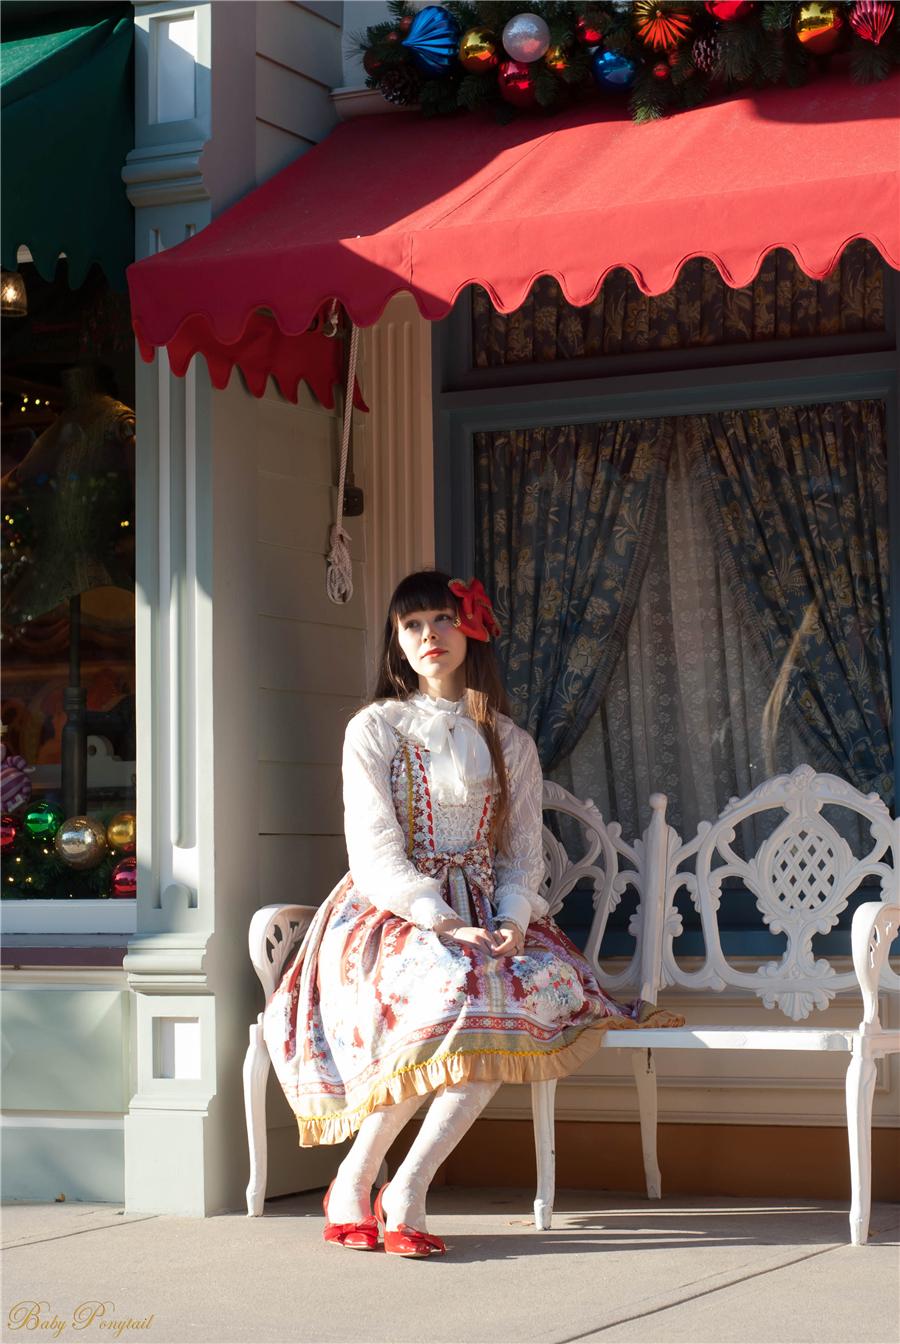 Baby Ponytail_Model Photo_Polly's Garden of Dreams_JSK Red_Claudia_0.jpg